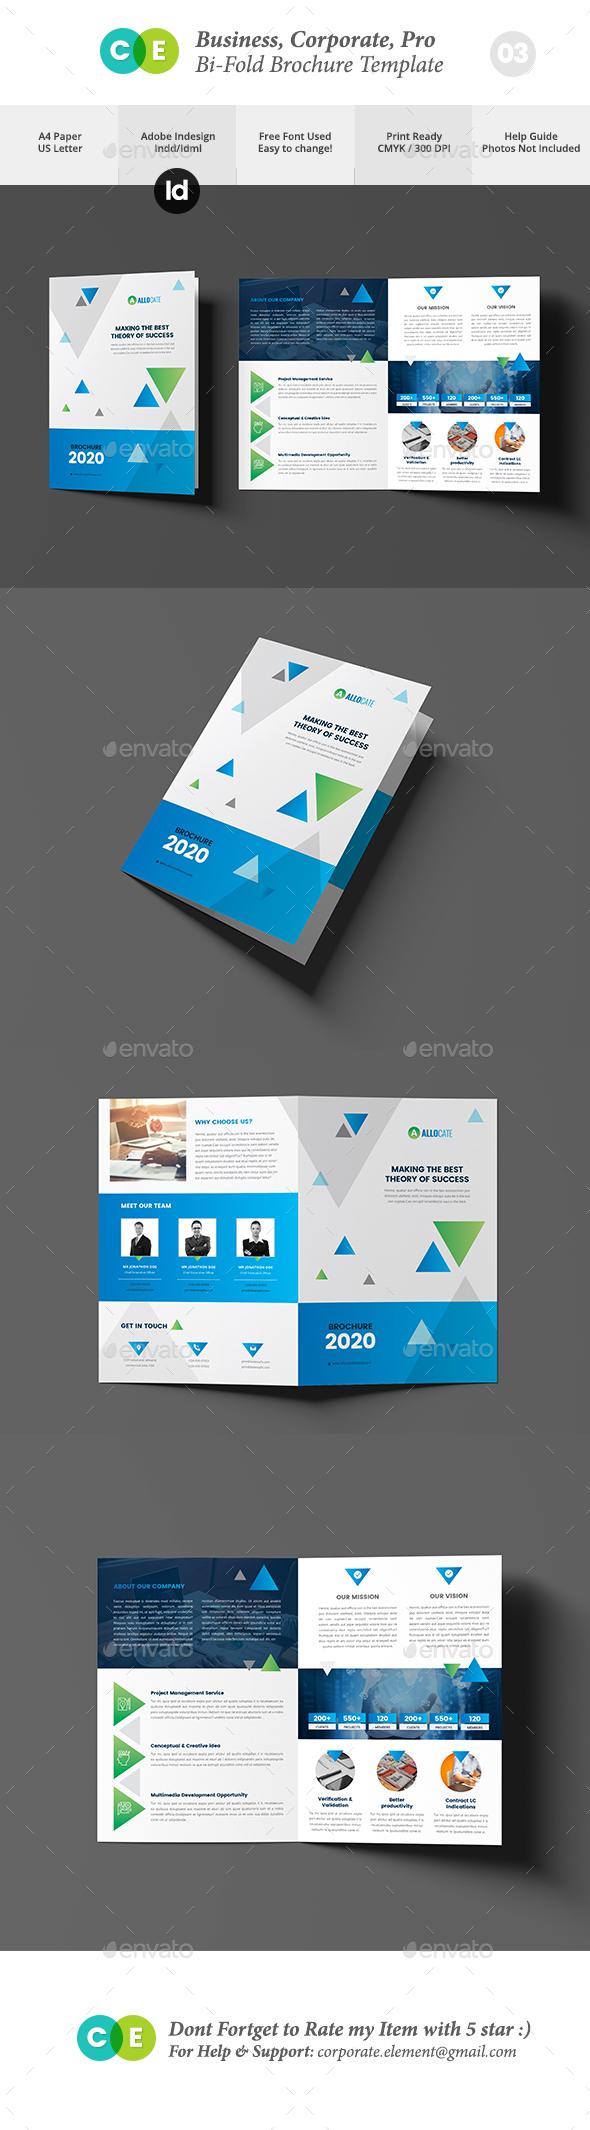 Corporate Business Pro Bi-Fold Brochure V03 - Brochures Print Templates